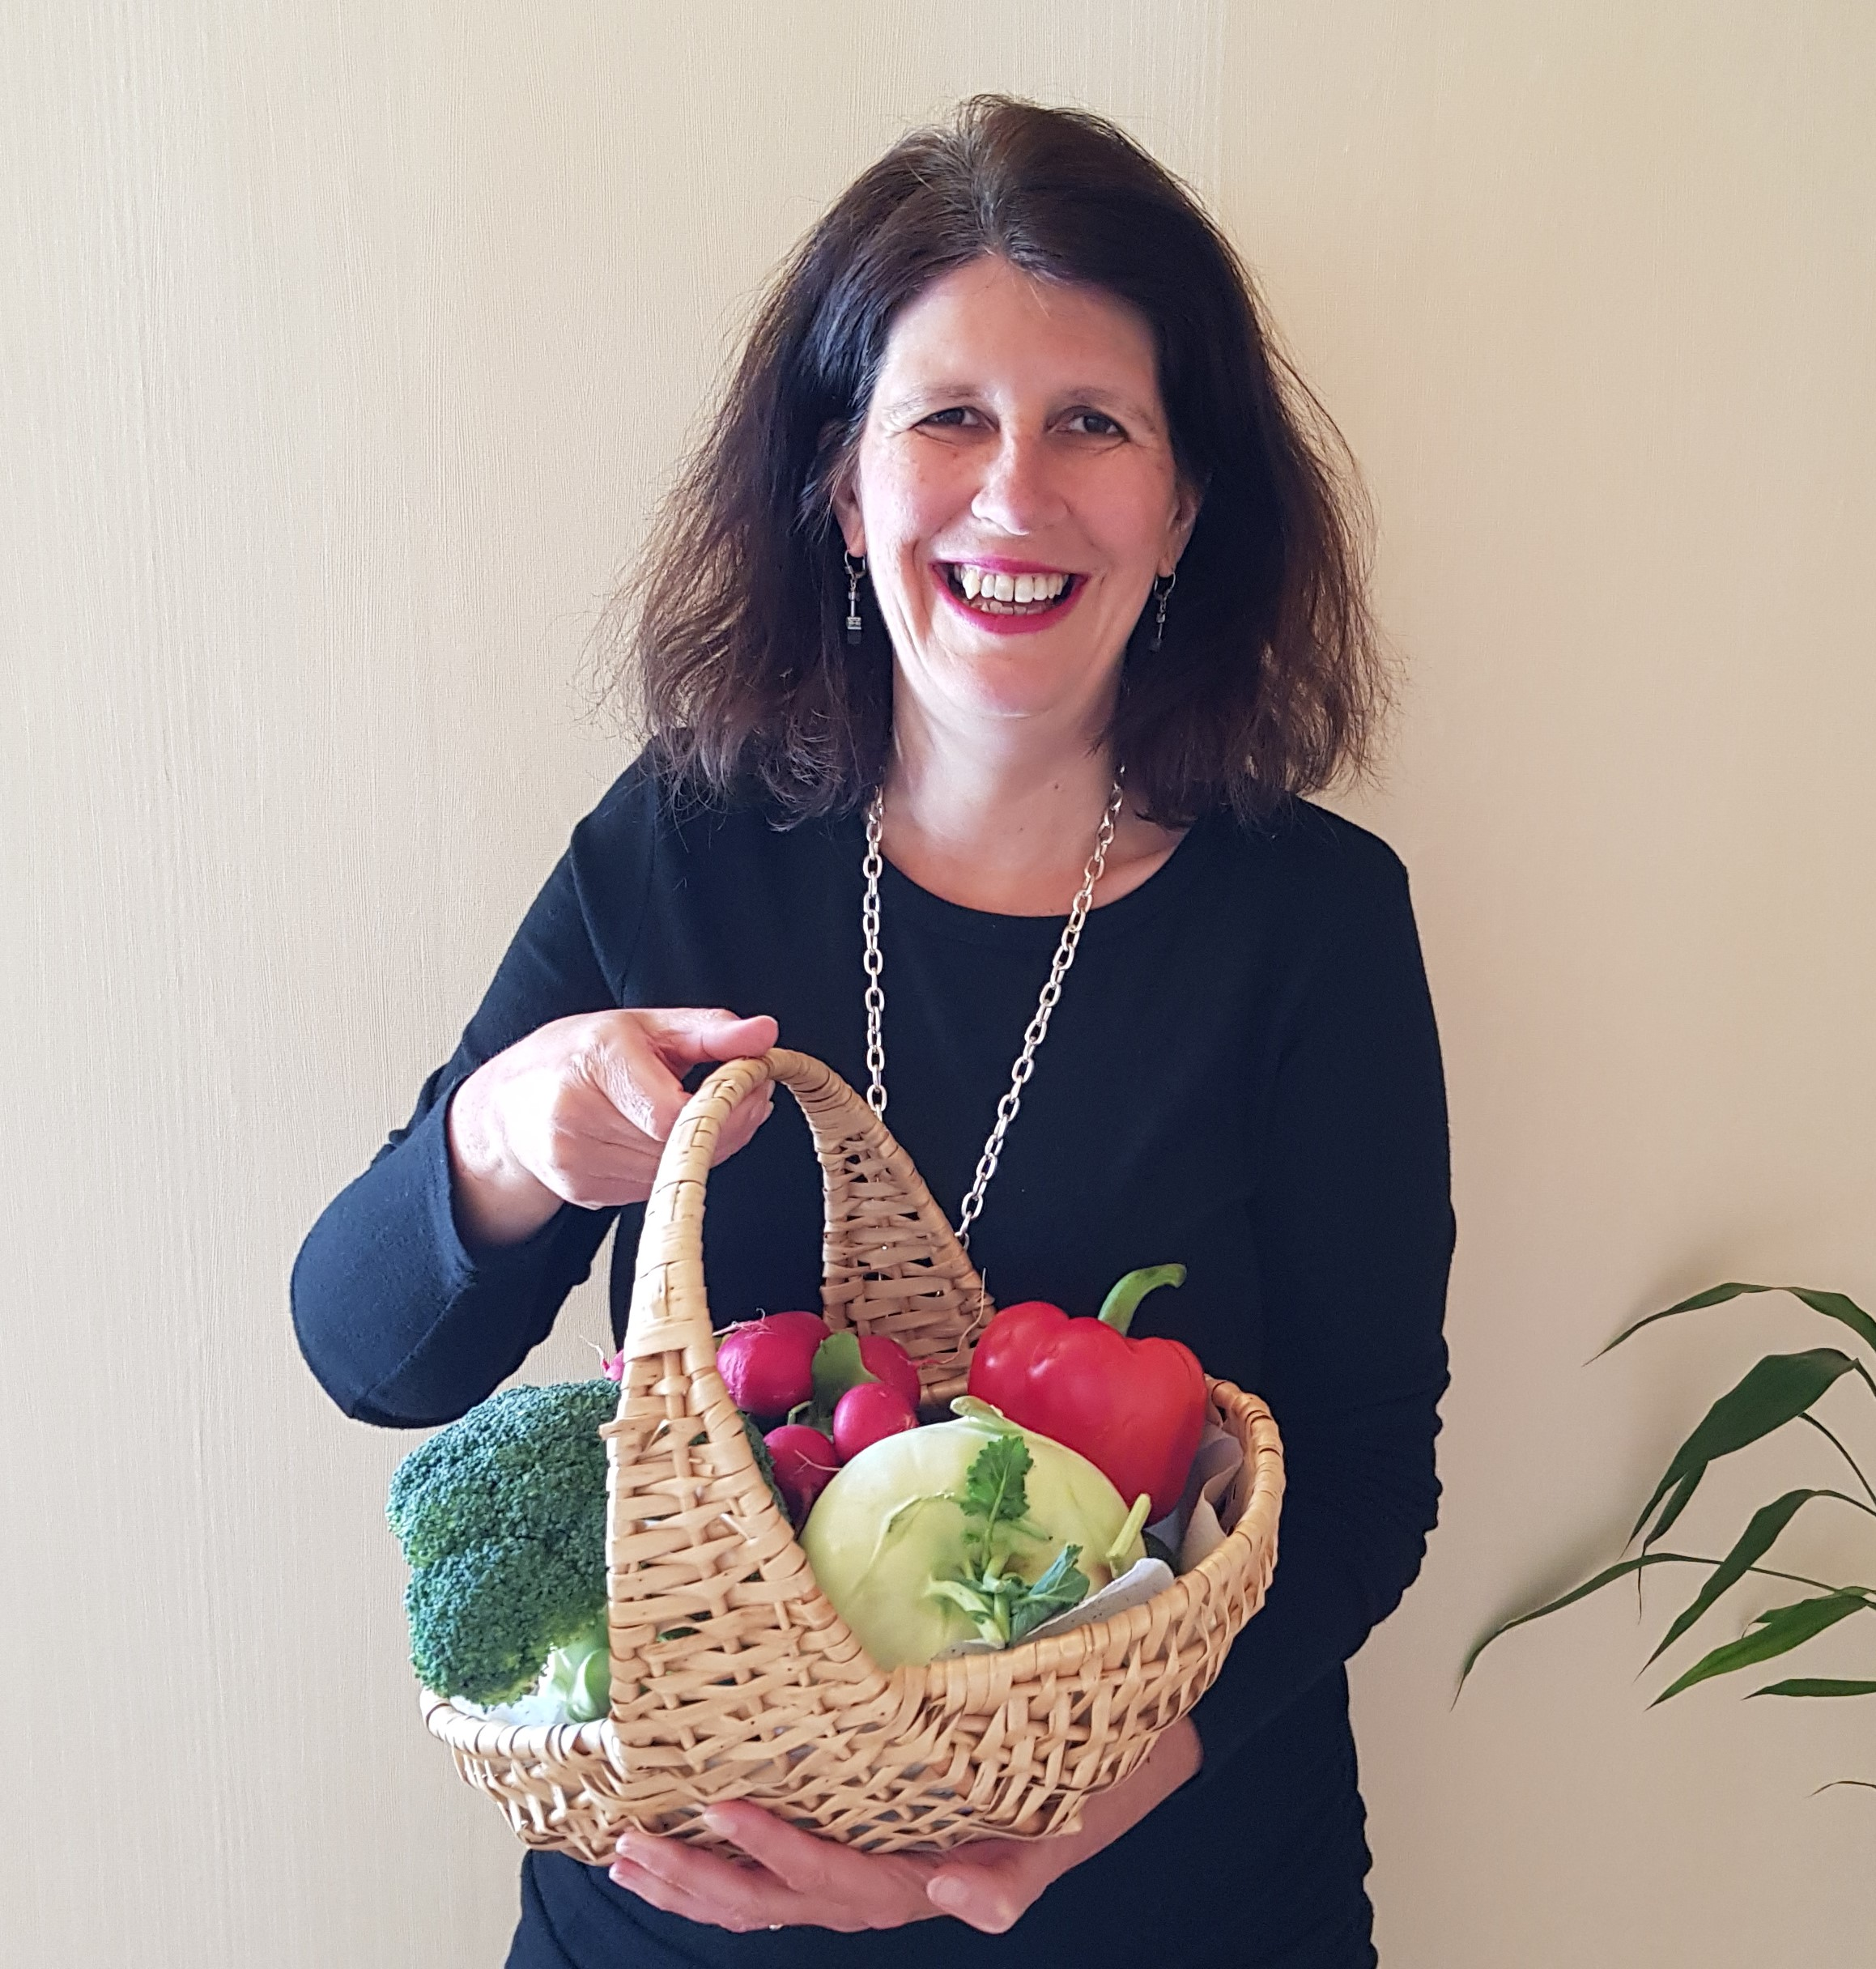 Silvia Berft - Gesundheitsberaterin